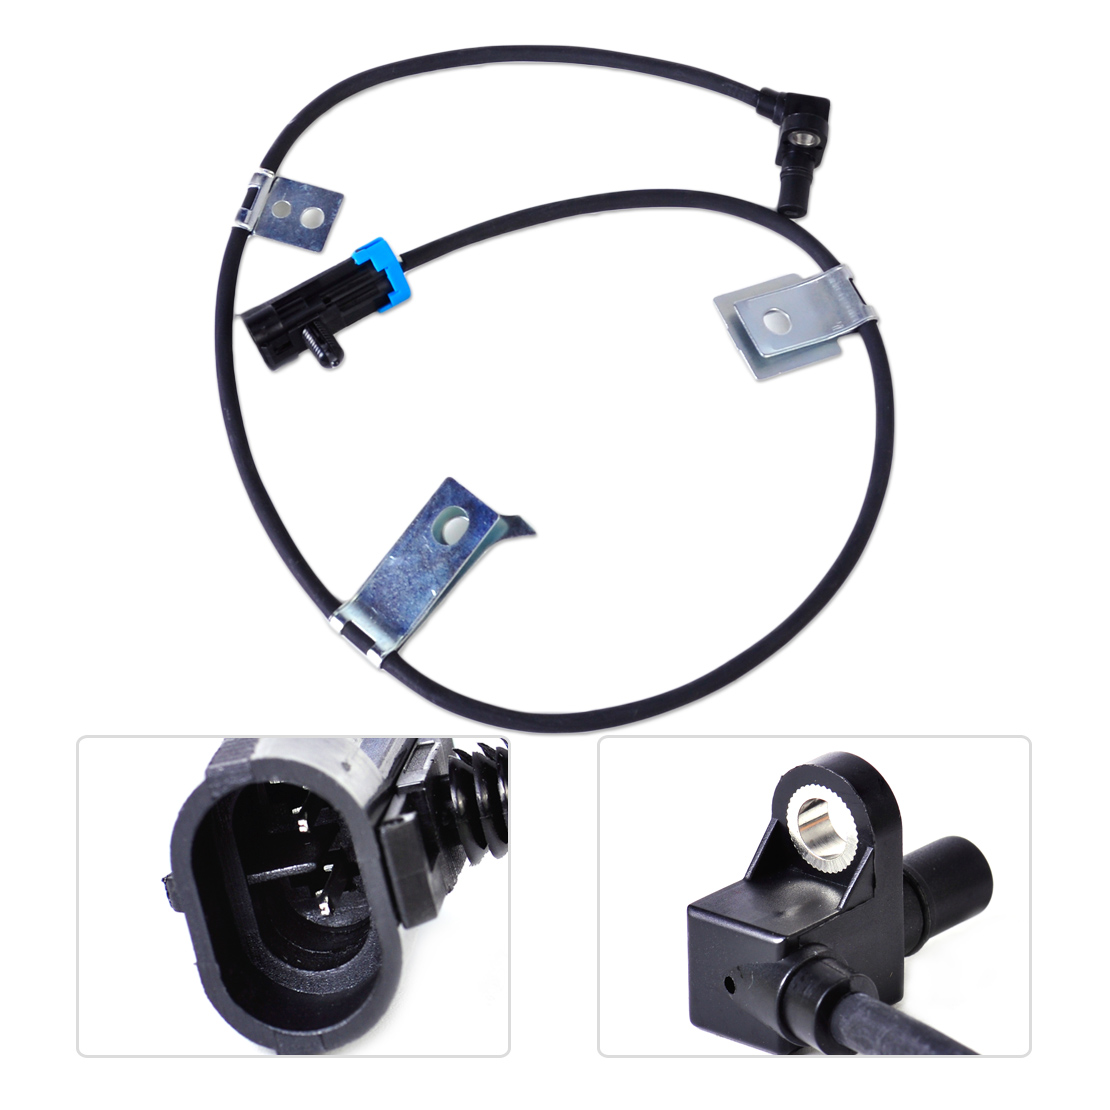 DWCX 15991986 Front Left / Right ABS Wheel Speed Sensor for Cadillac Escalade Chevrolet Chevy Express K1500 Silverado Tahoe